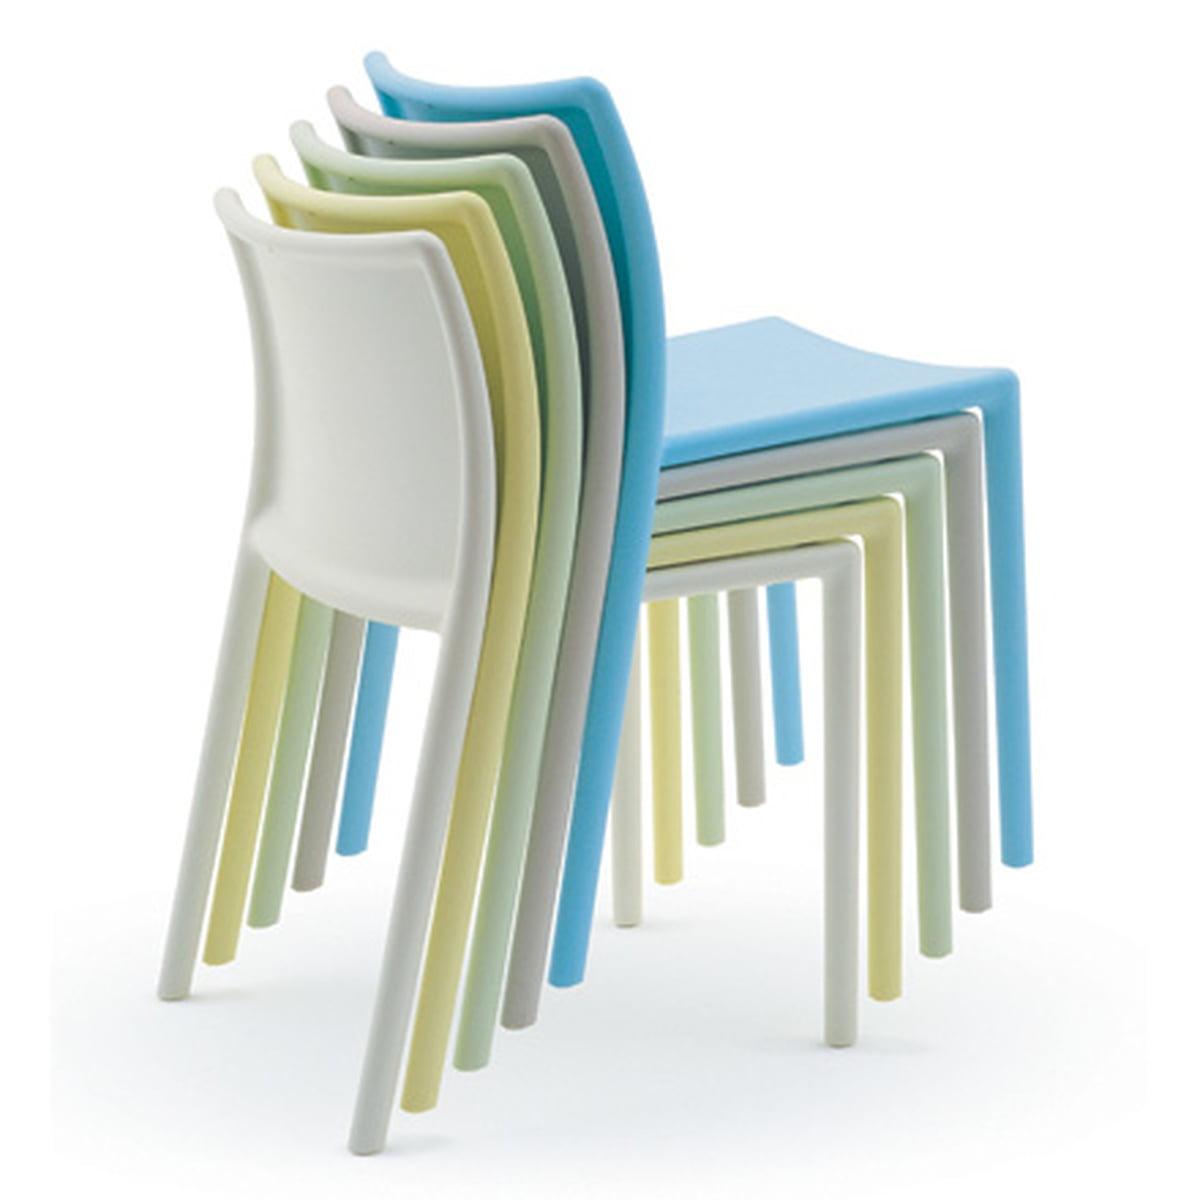 air chair by magis in the shop